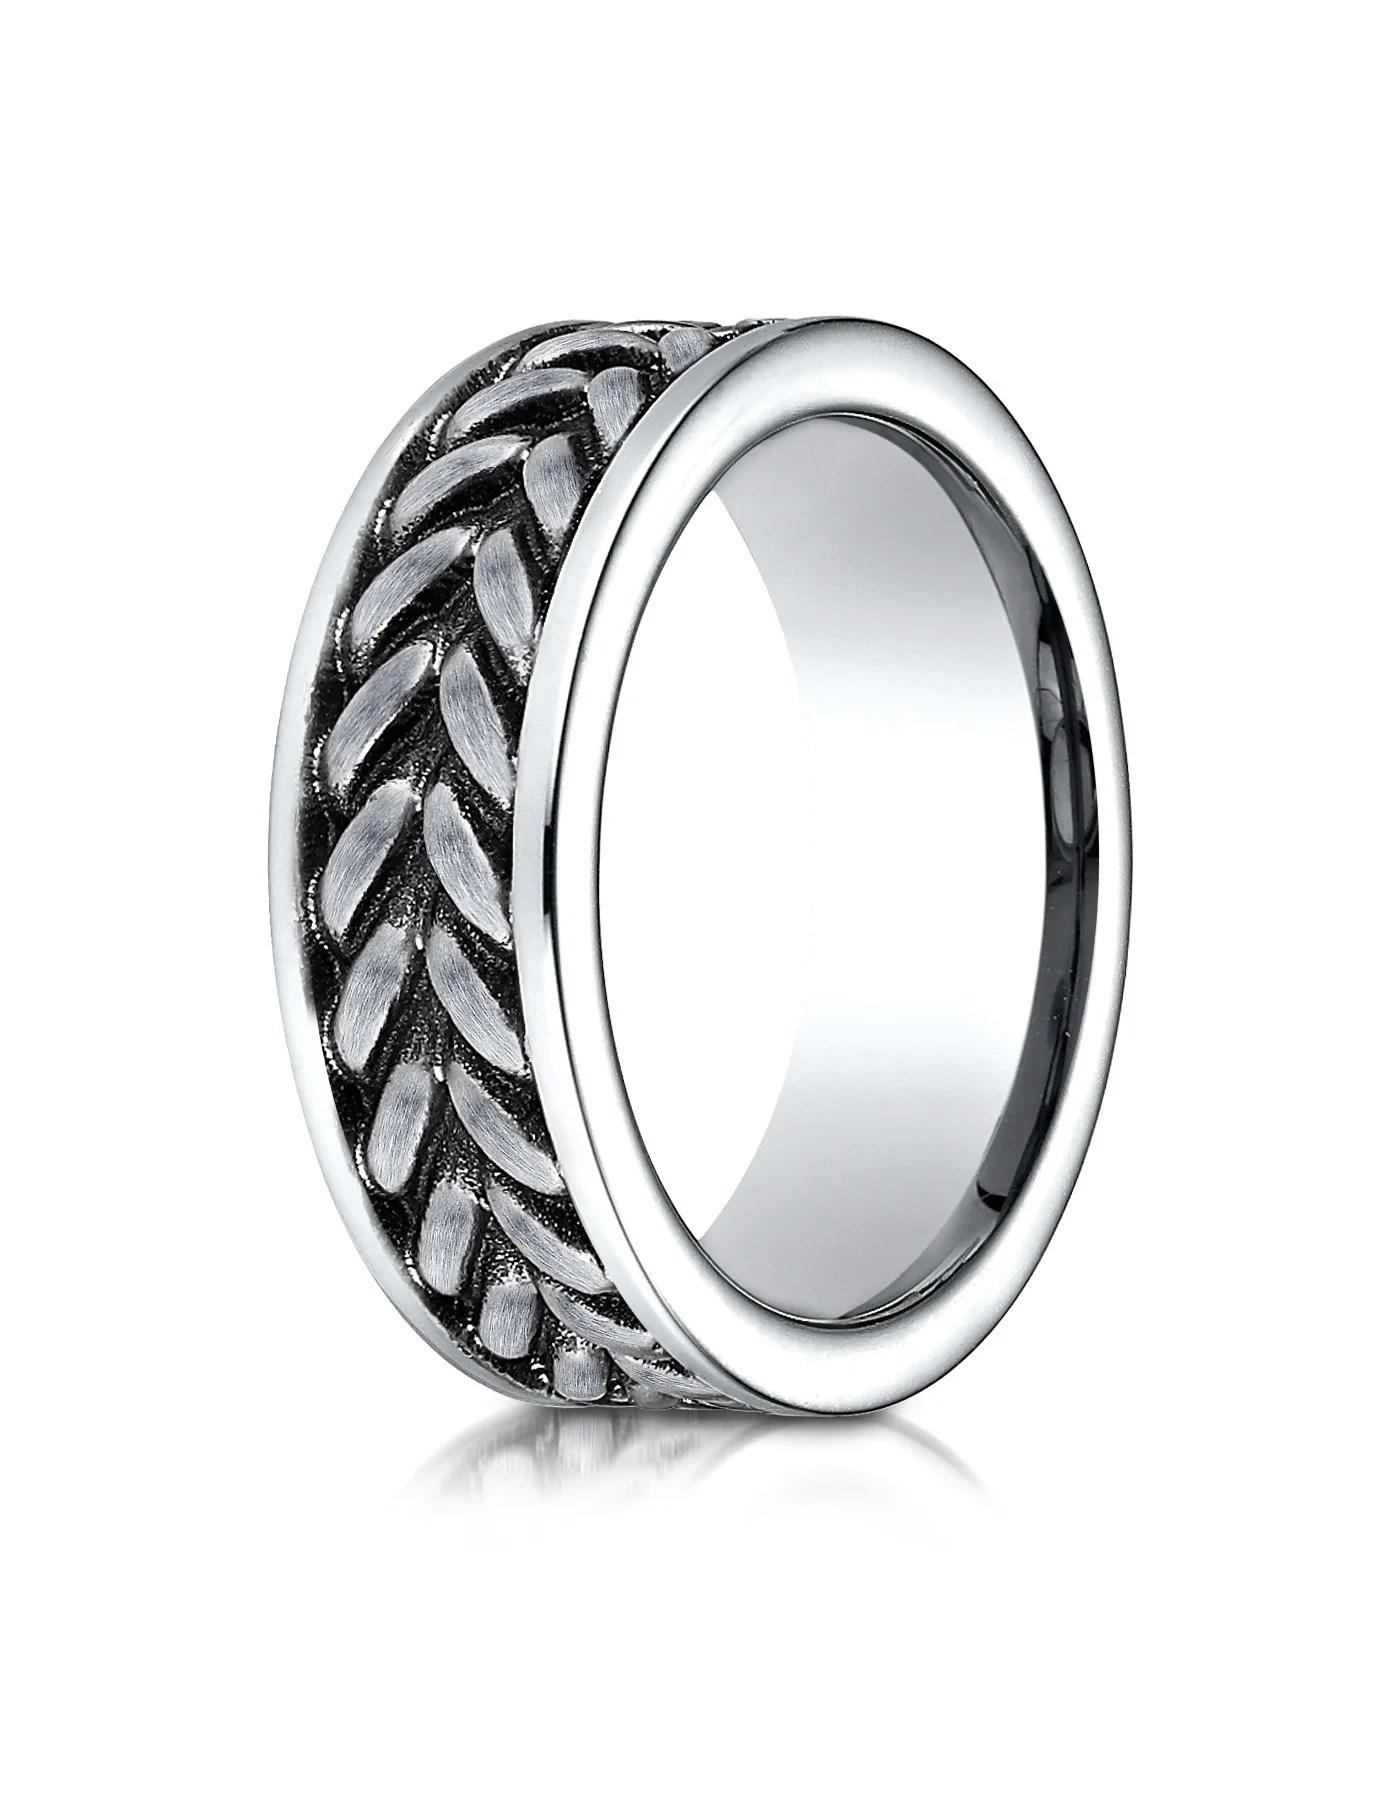 ferrara men s cobalt wedding band with zippered pattern center by benchmark cobalt wedding rings FERRARA Men s Cobalt Wedding Band with Zippered Pattern